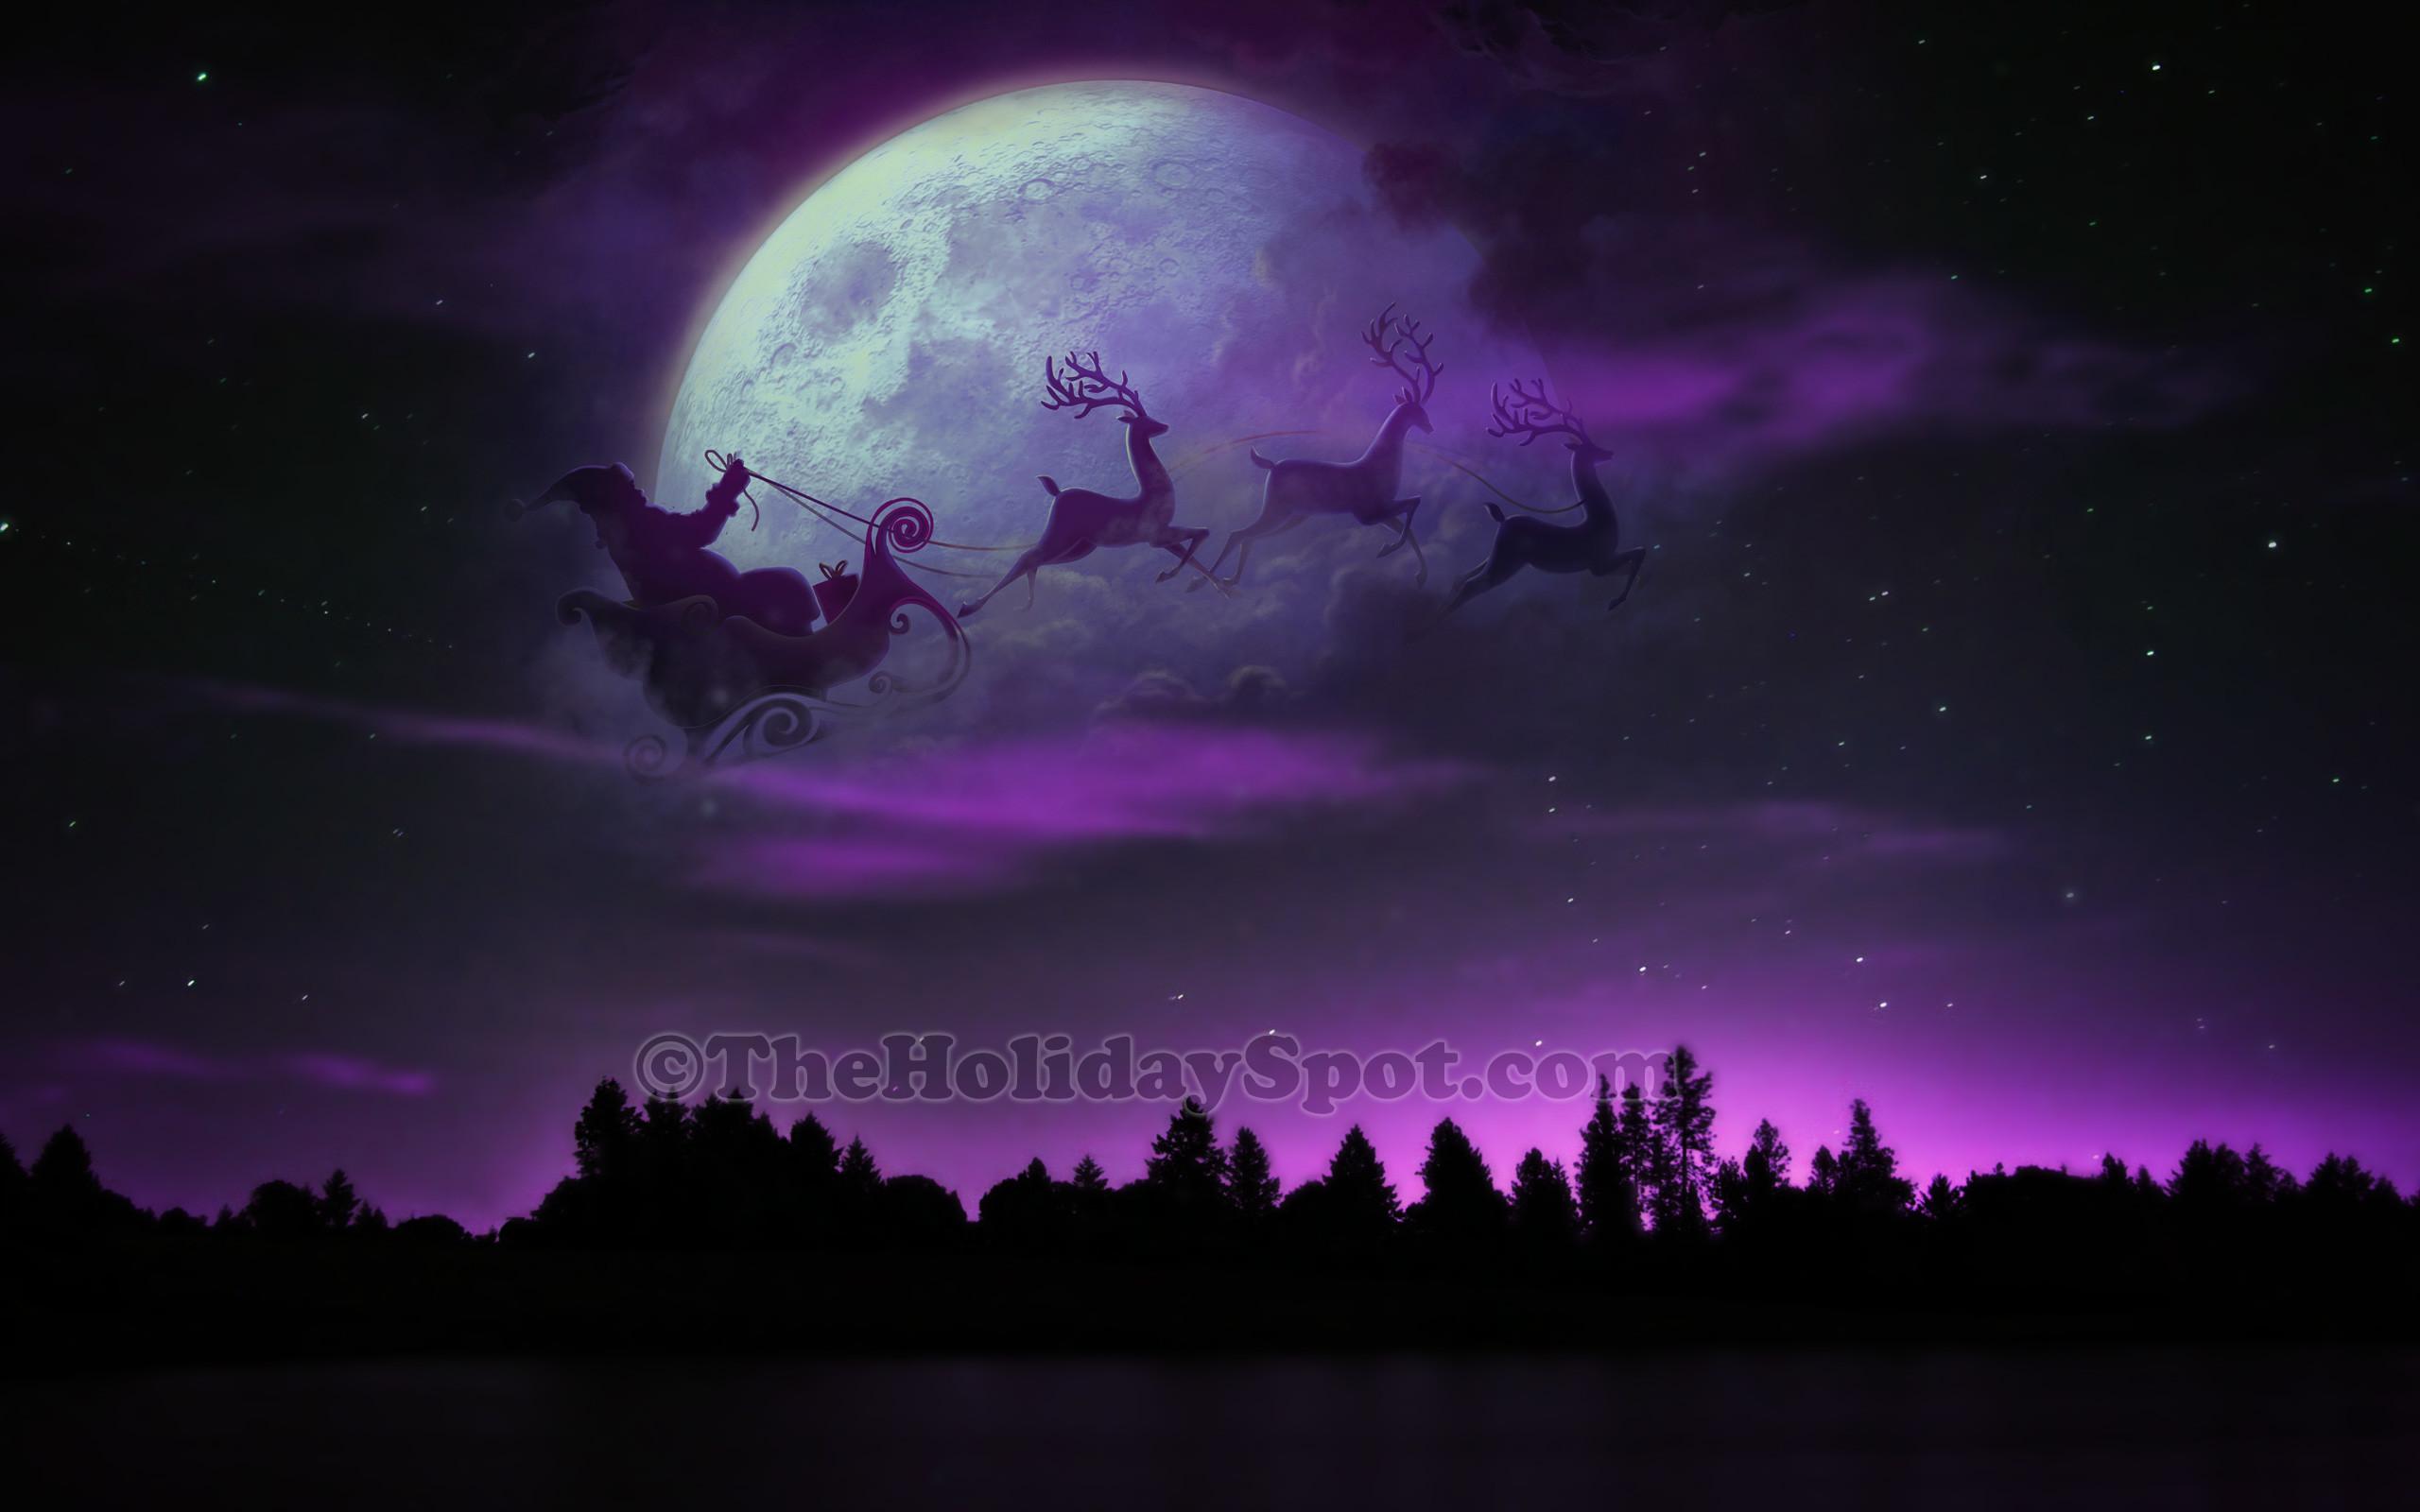 HD Wallpaper – Santa, Sleigh and Reindeer at Christmas Night